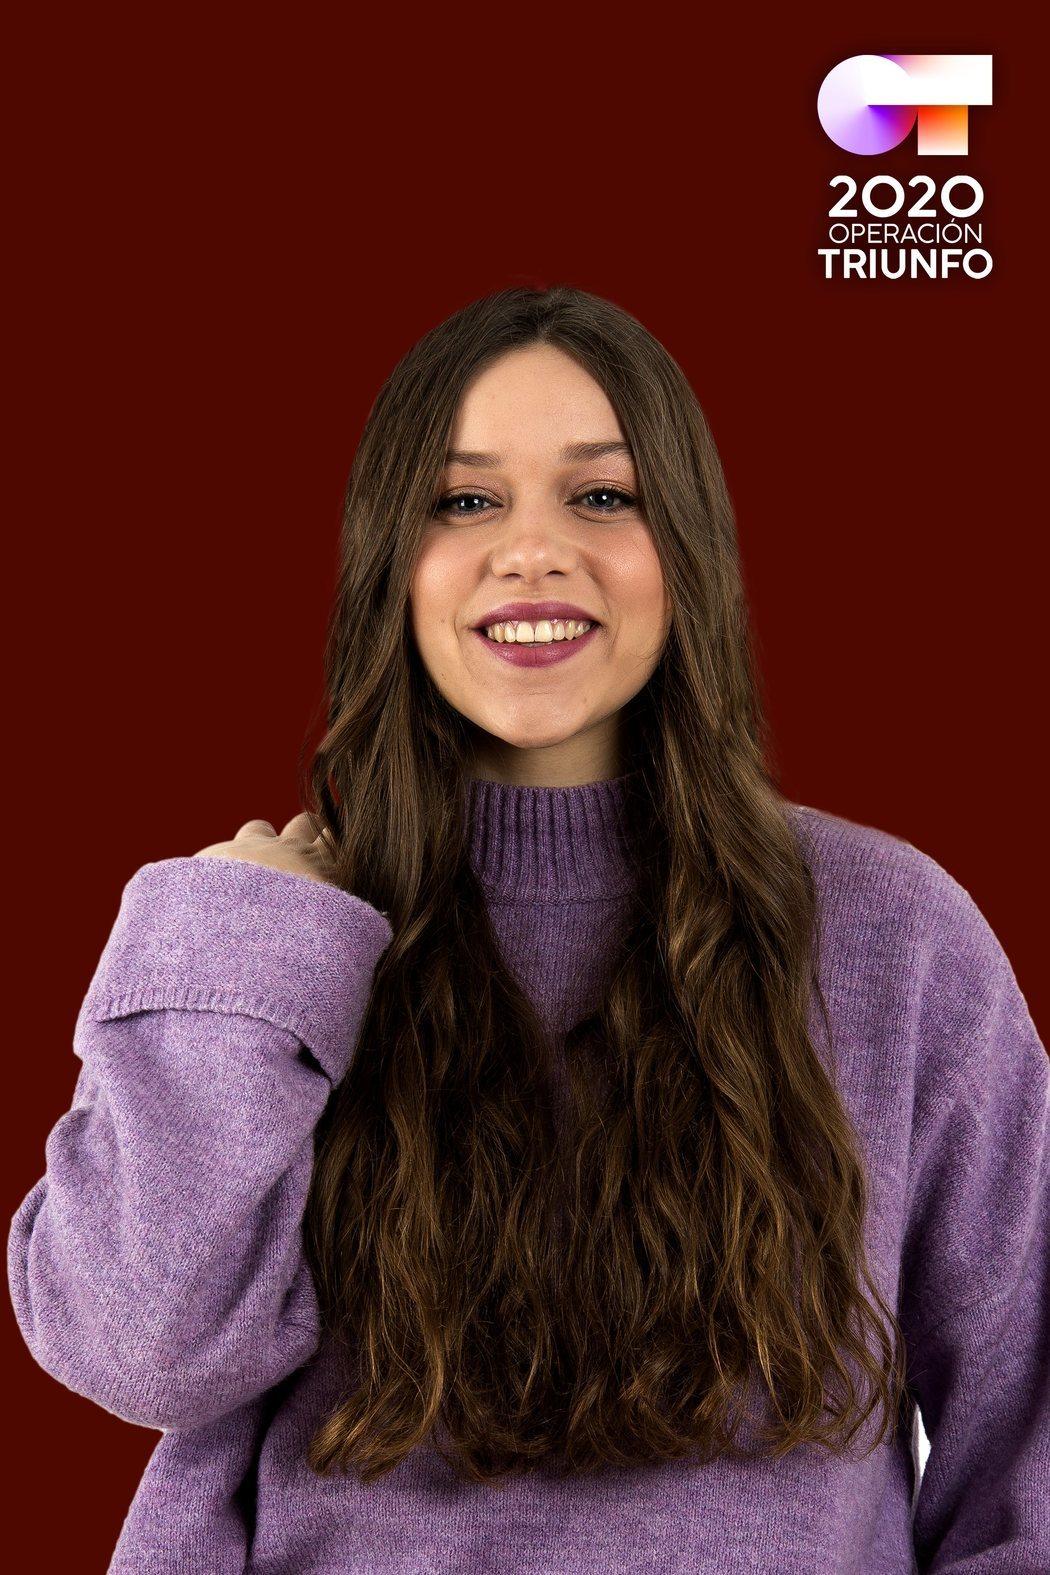 Eva Barreiro, concursante de 'OT 2020'